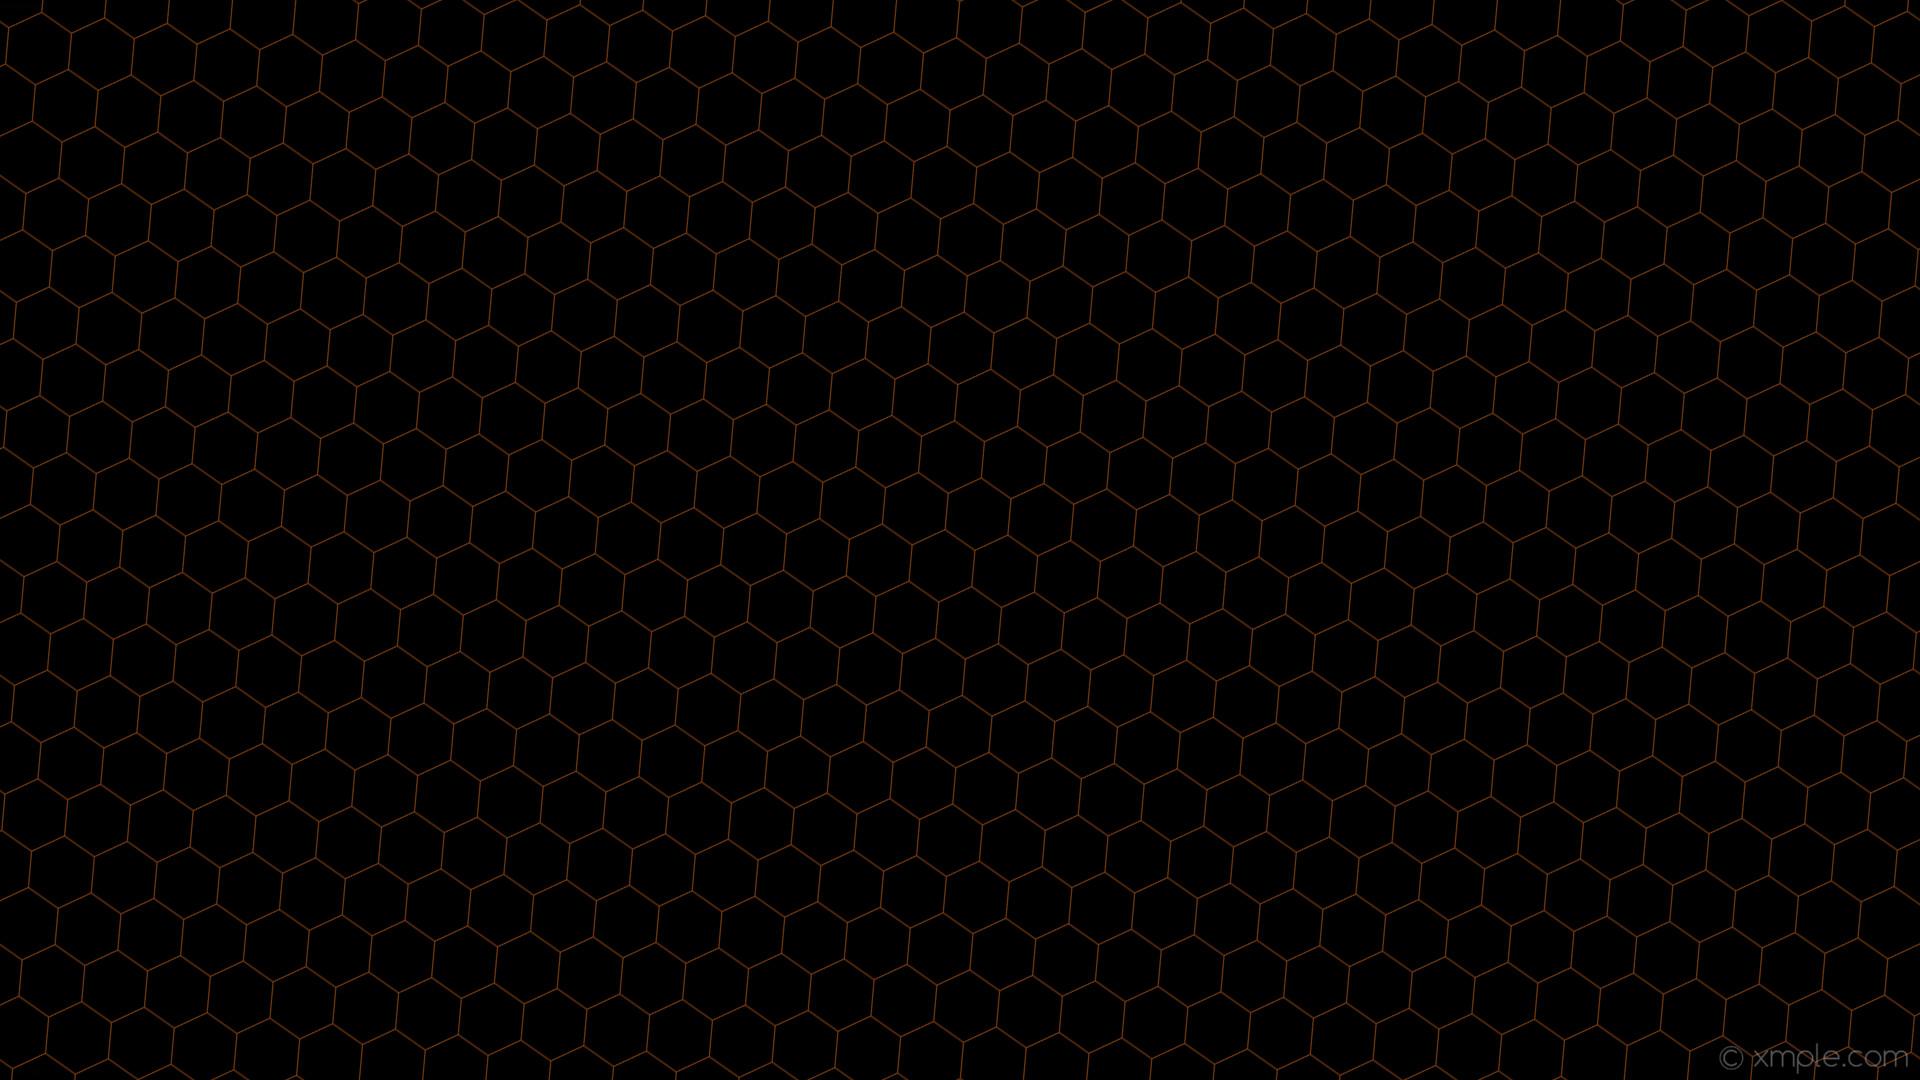 wallpaper black drop shadow brown beehive hexagon saddle brown #8b4513  #000000 45° 1px